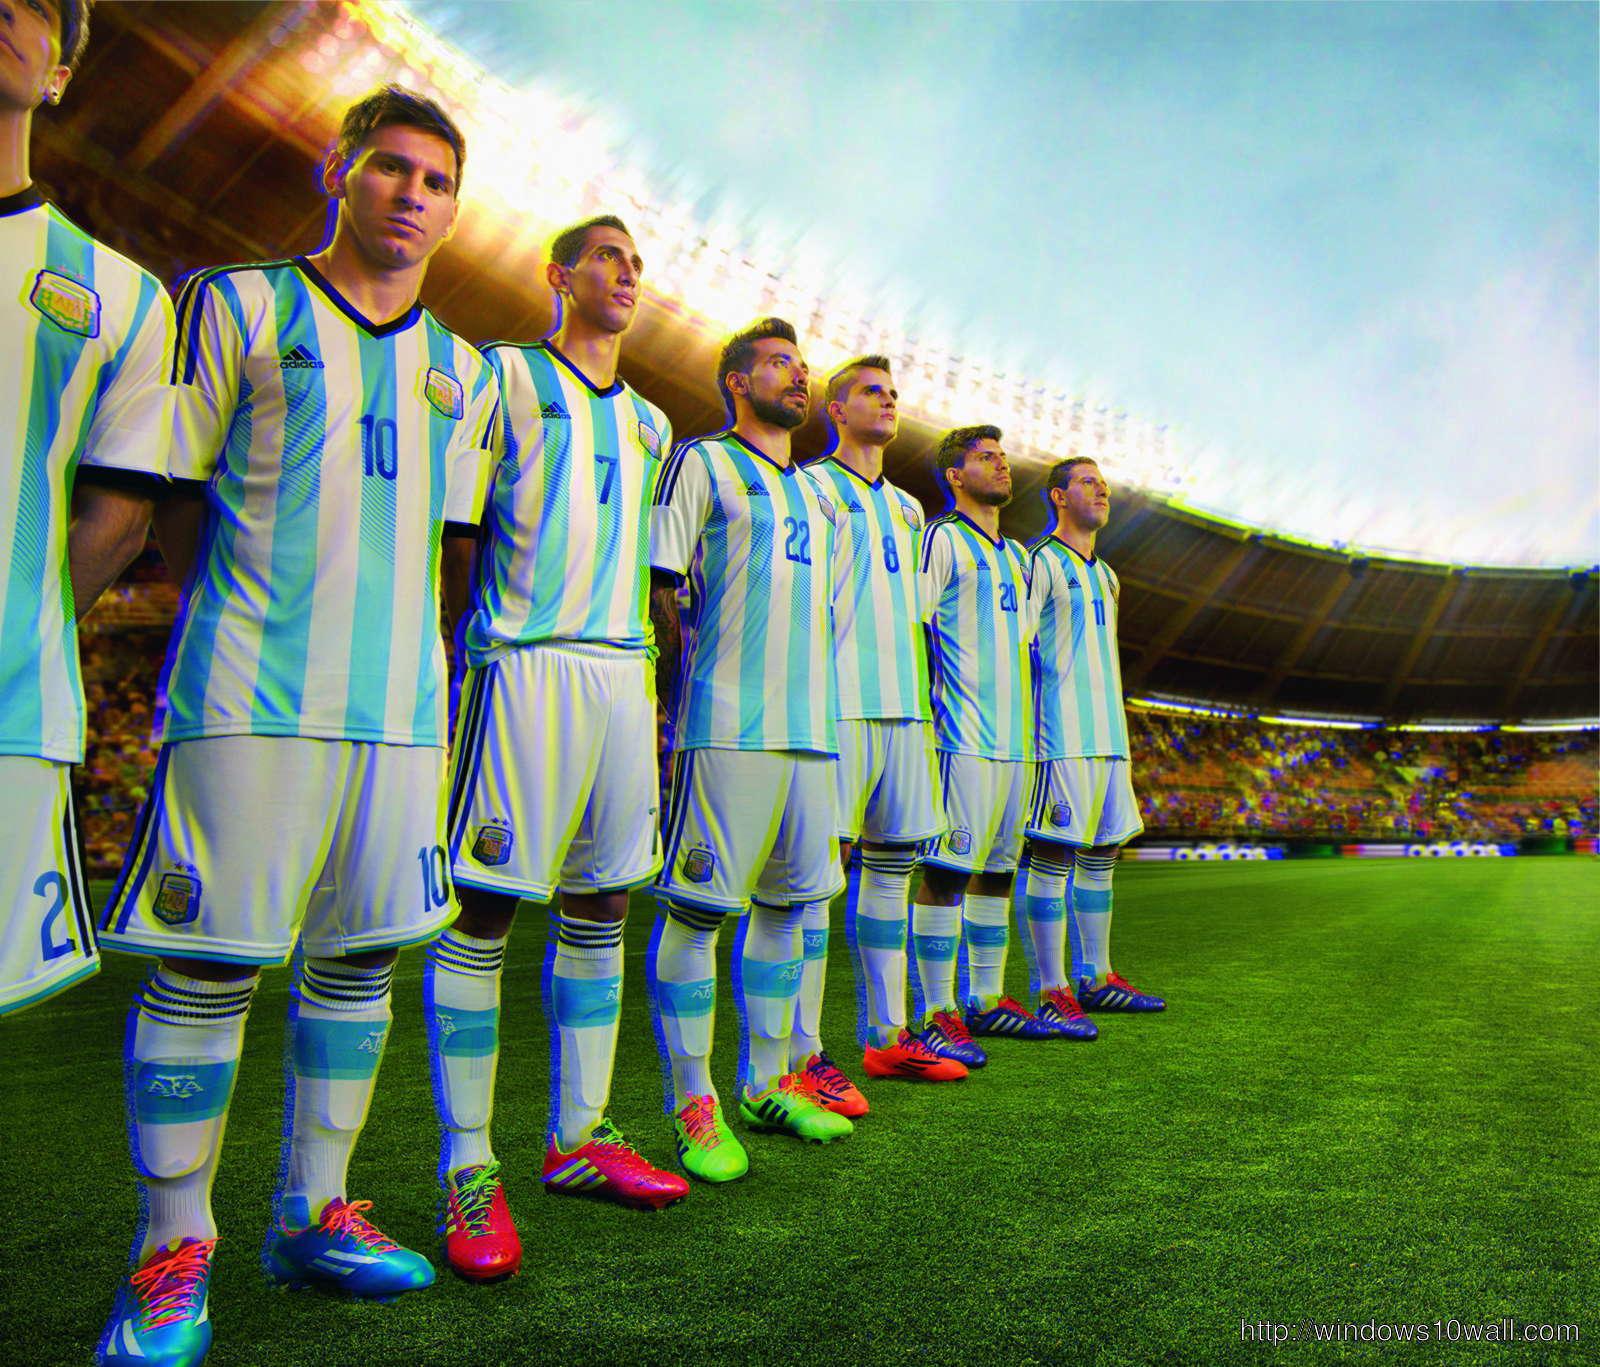 Argentina Team World Cup 2014 HD Wallpaper